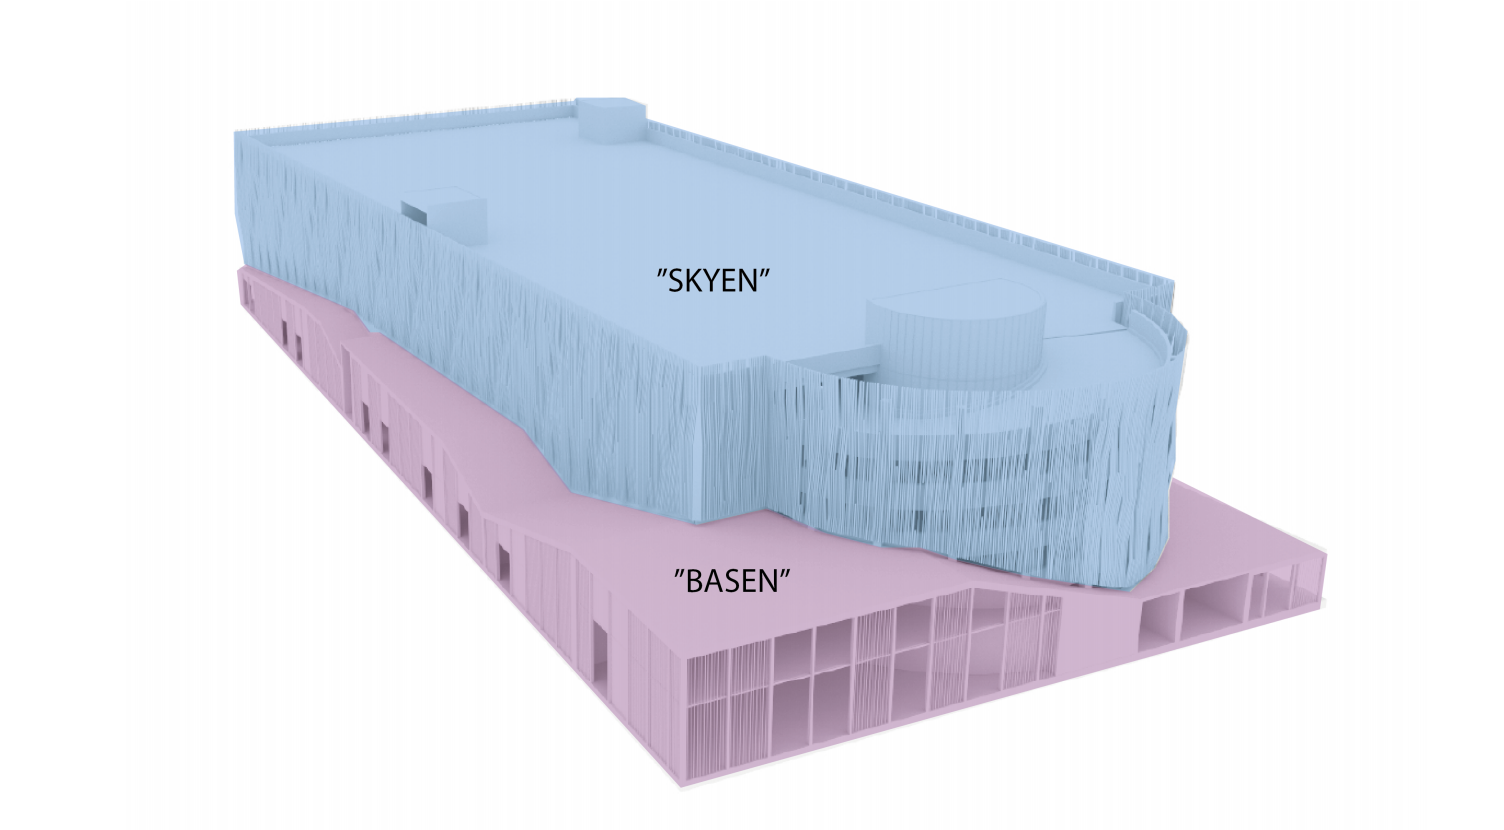 Stort projekt på vej: Her kommer nyt skyview over Aalborg